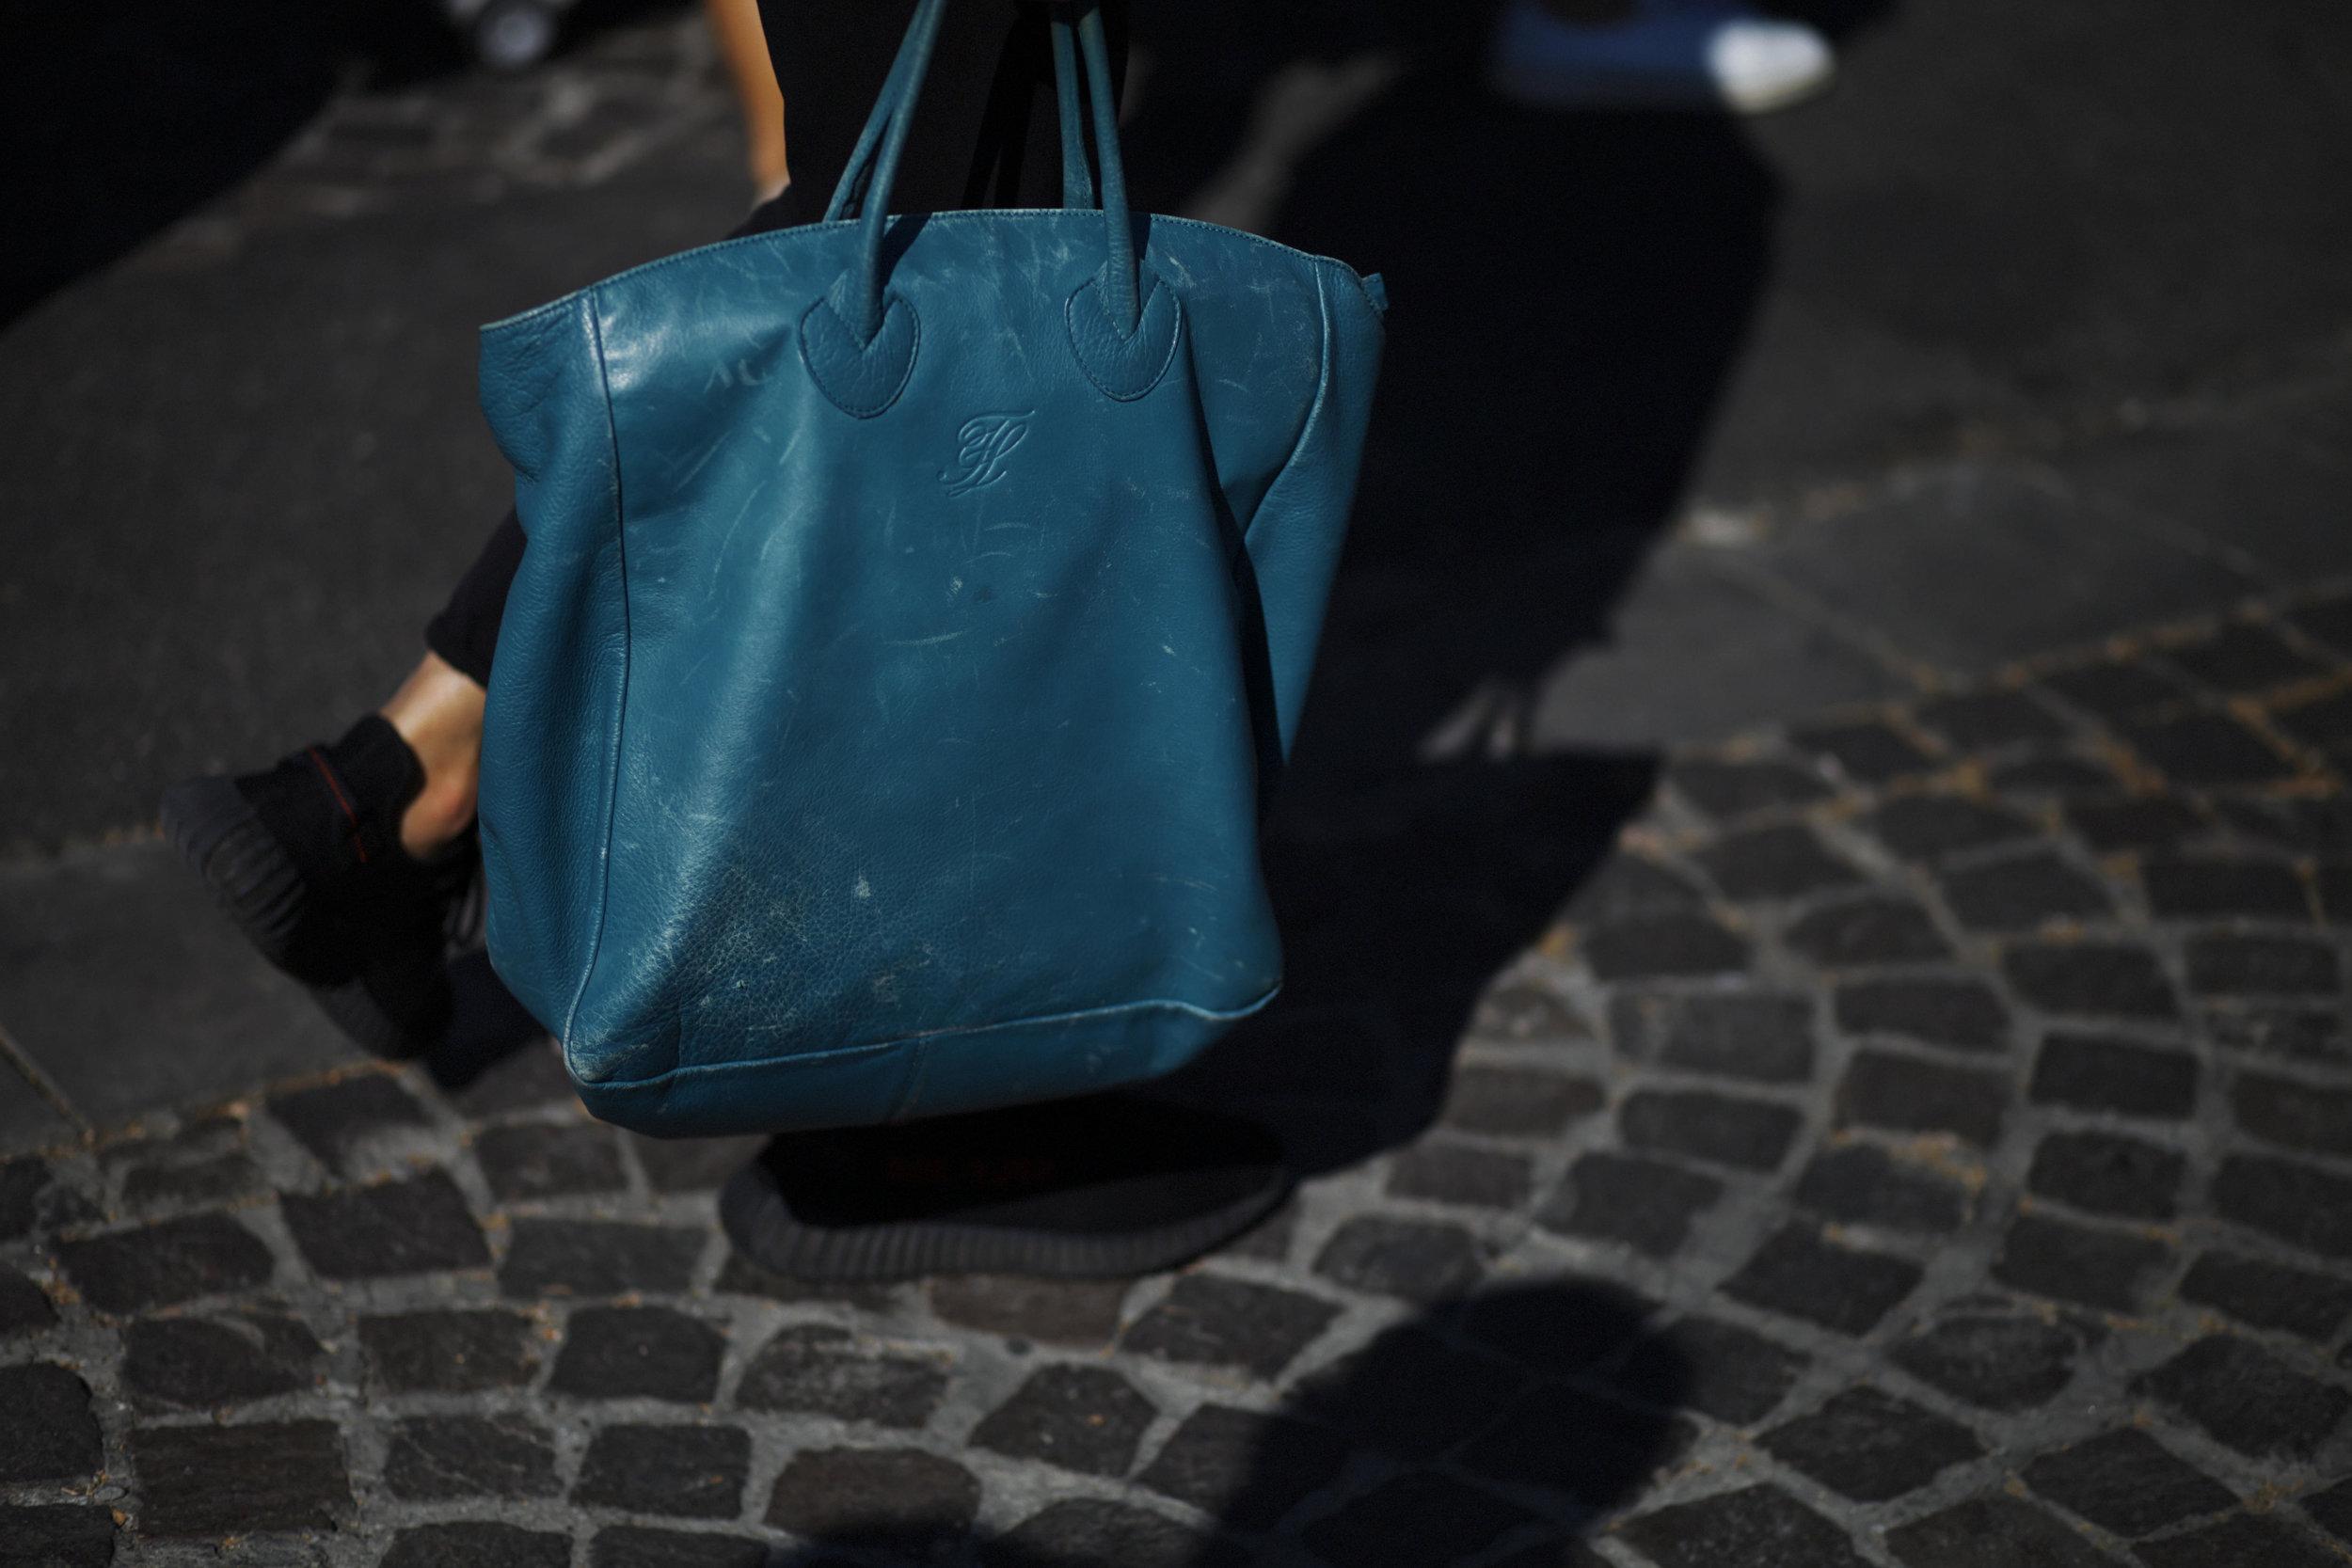 Pitti Uomo les indispensables paris 92 Florence bag sac cuir leather bleu